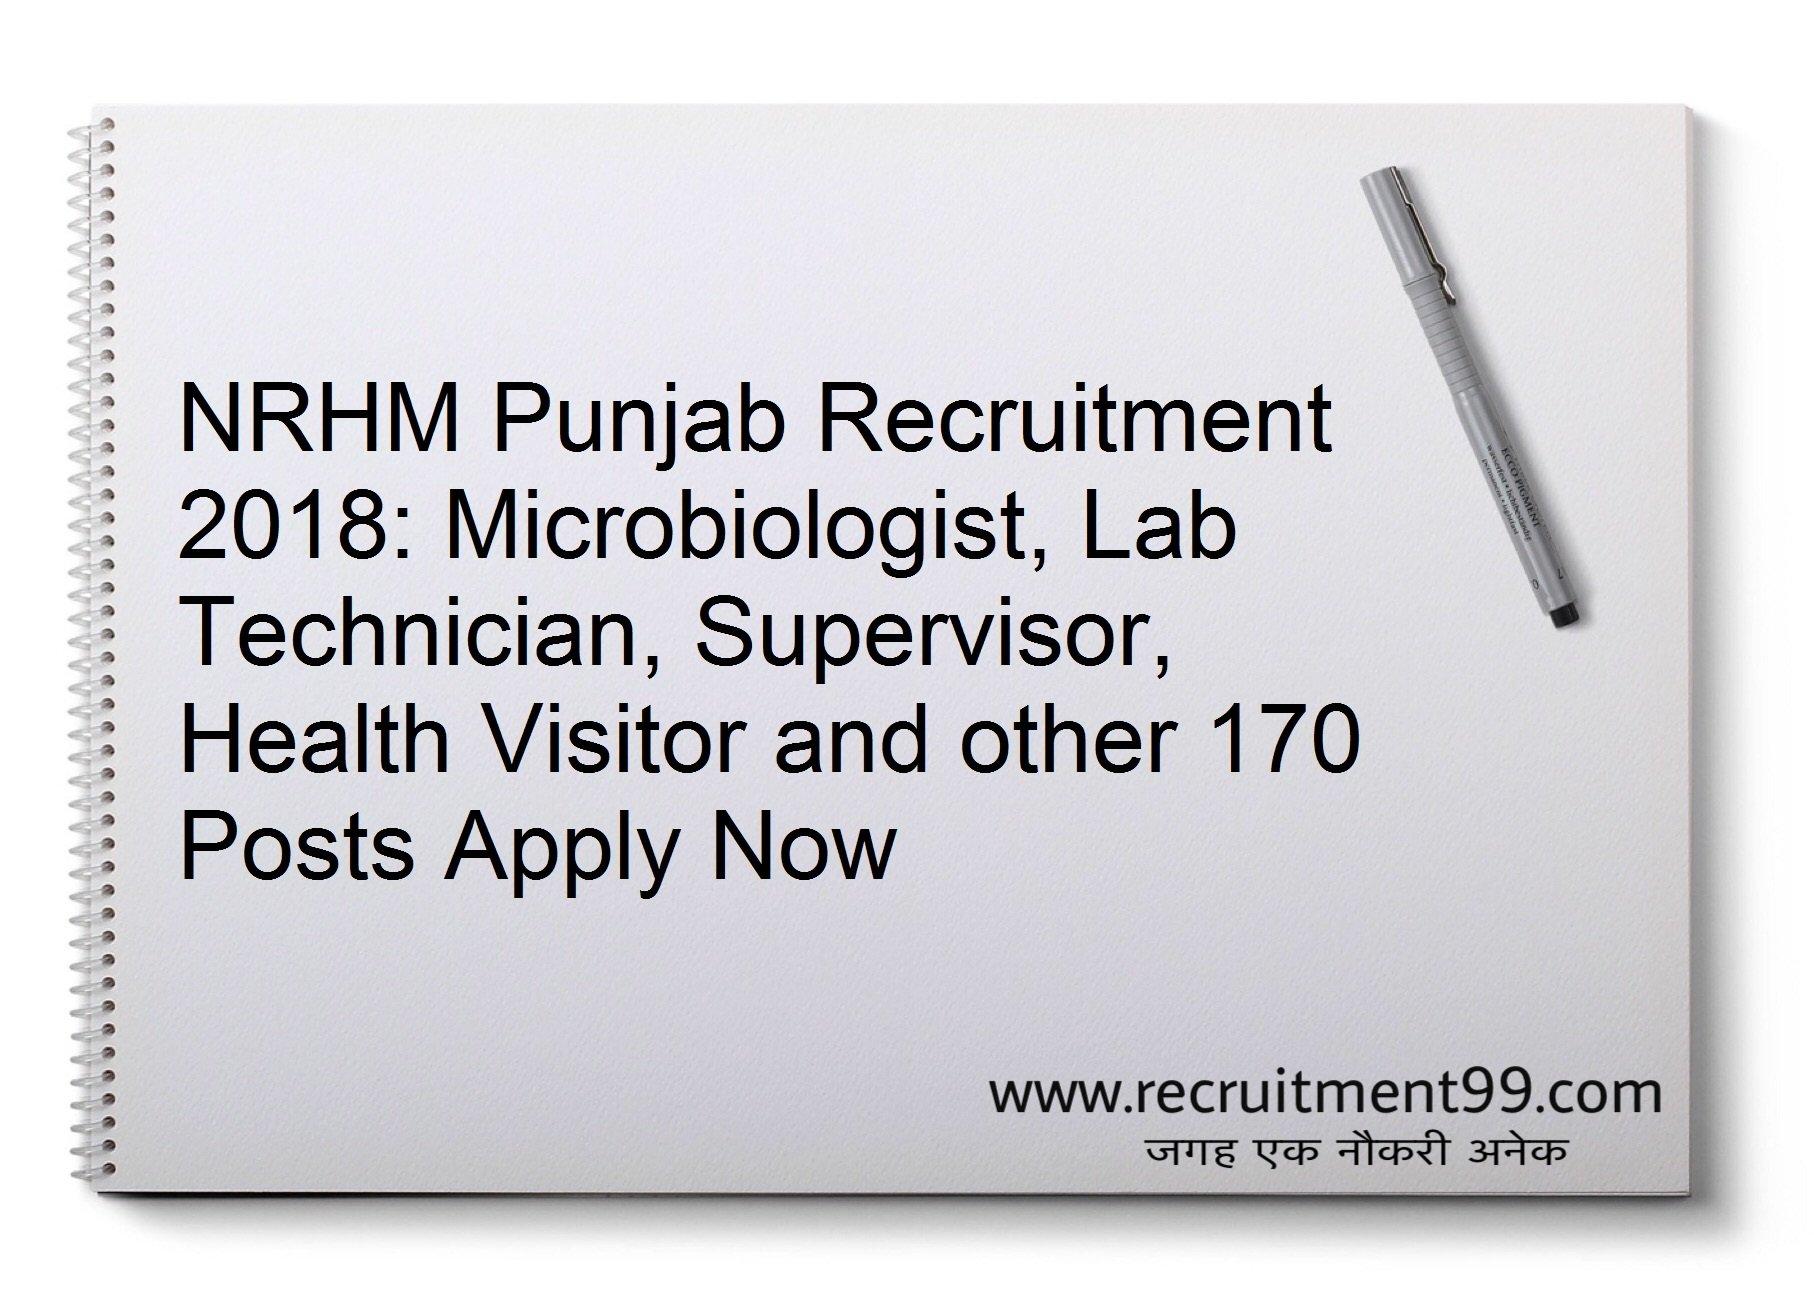 NRHM Punjab TB Health Visitor, Senior DOTS-Plus TB HV Supervisor Recruitment Admit Card Result 2018